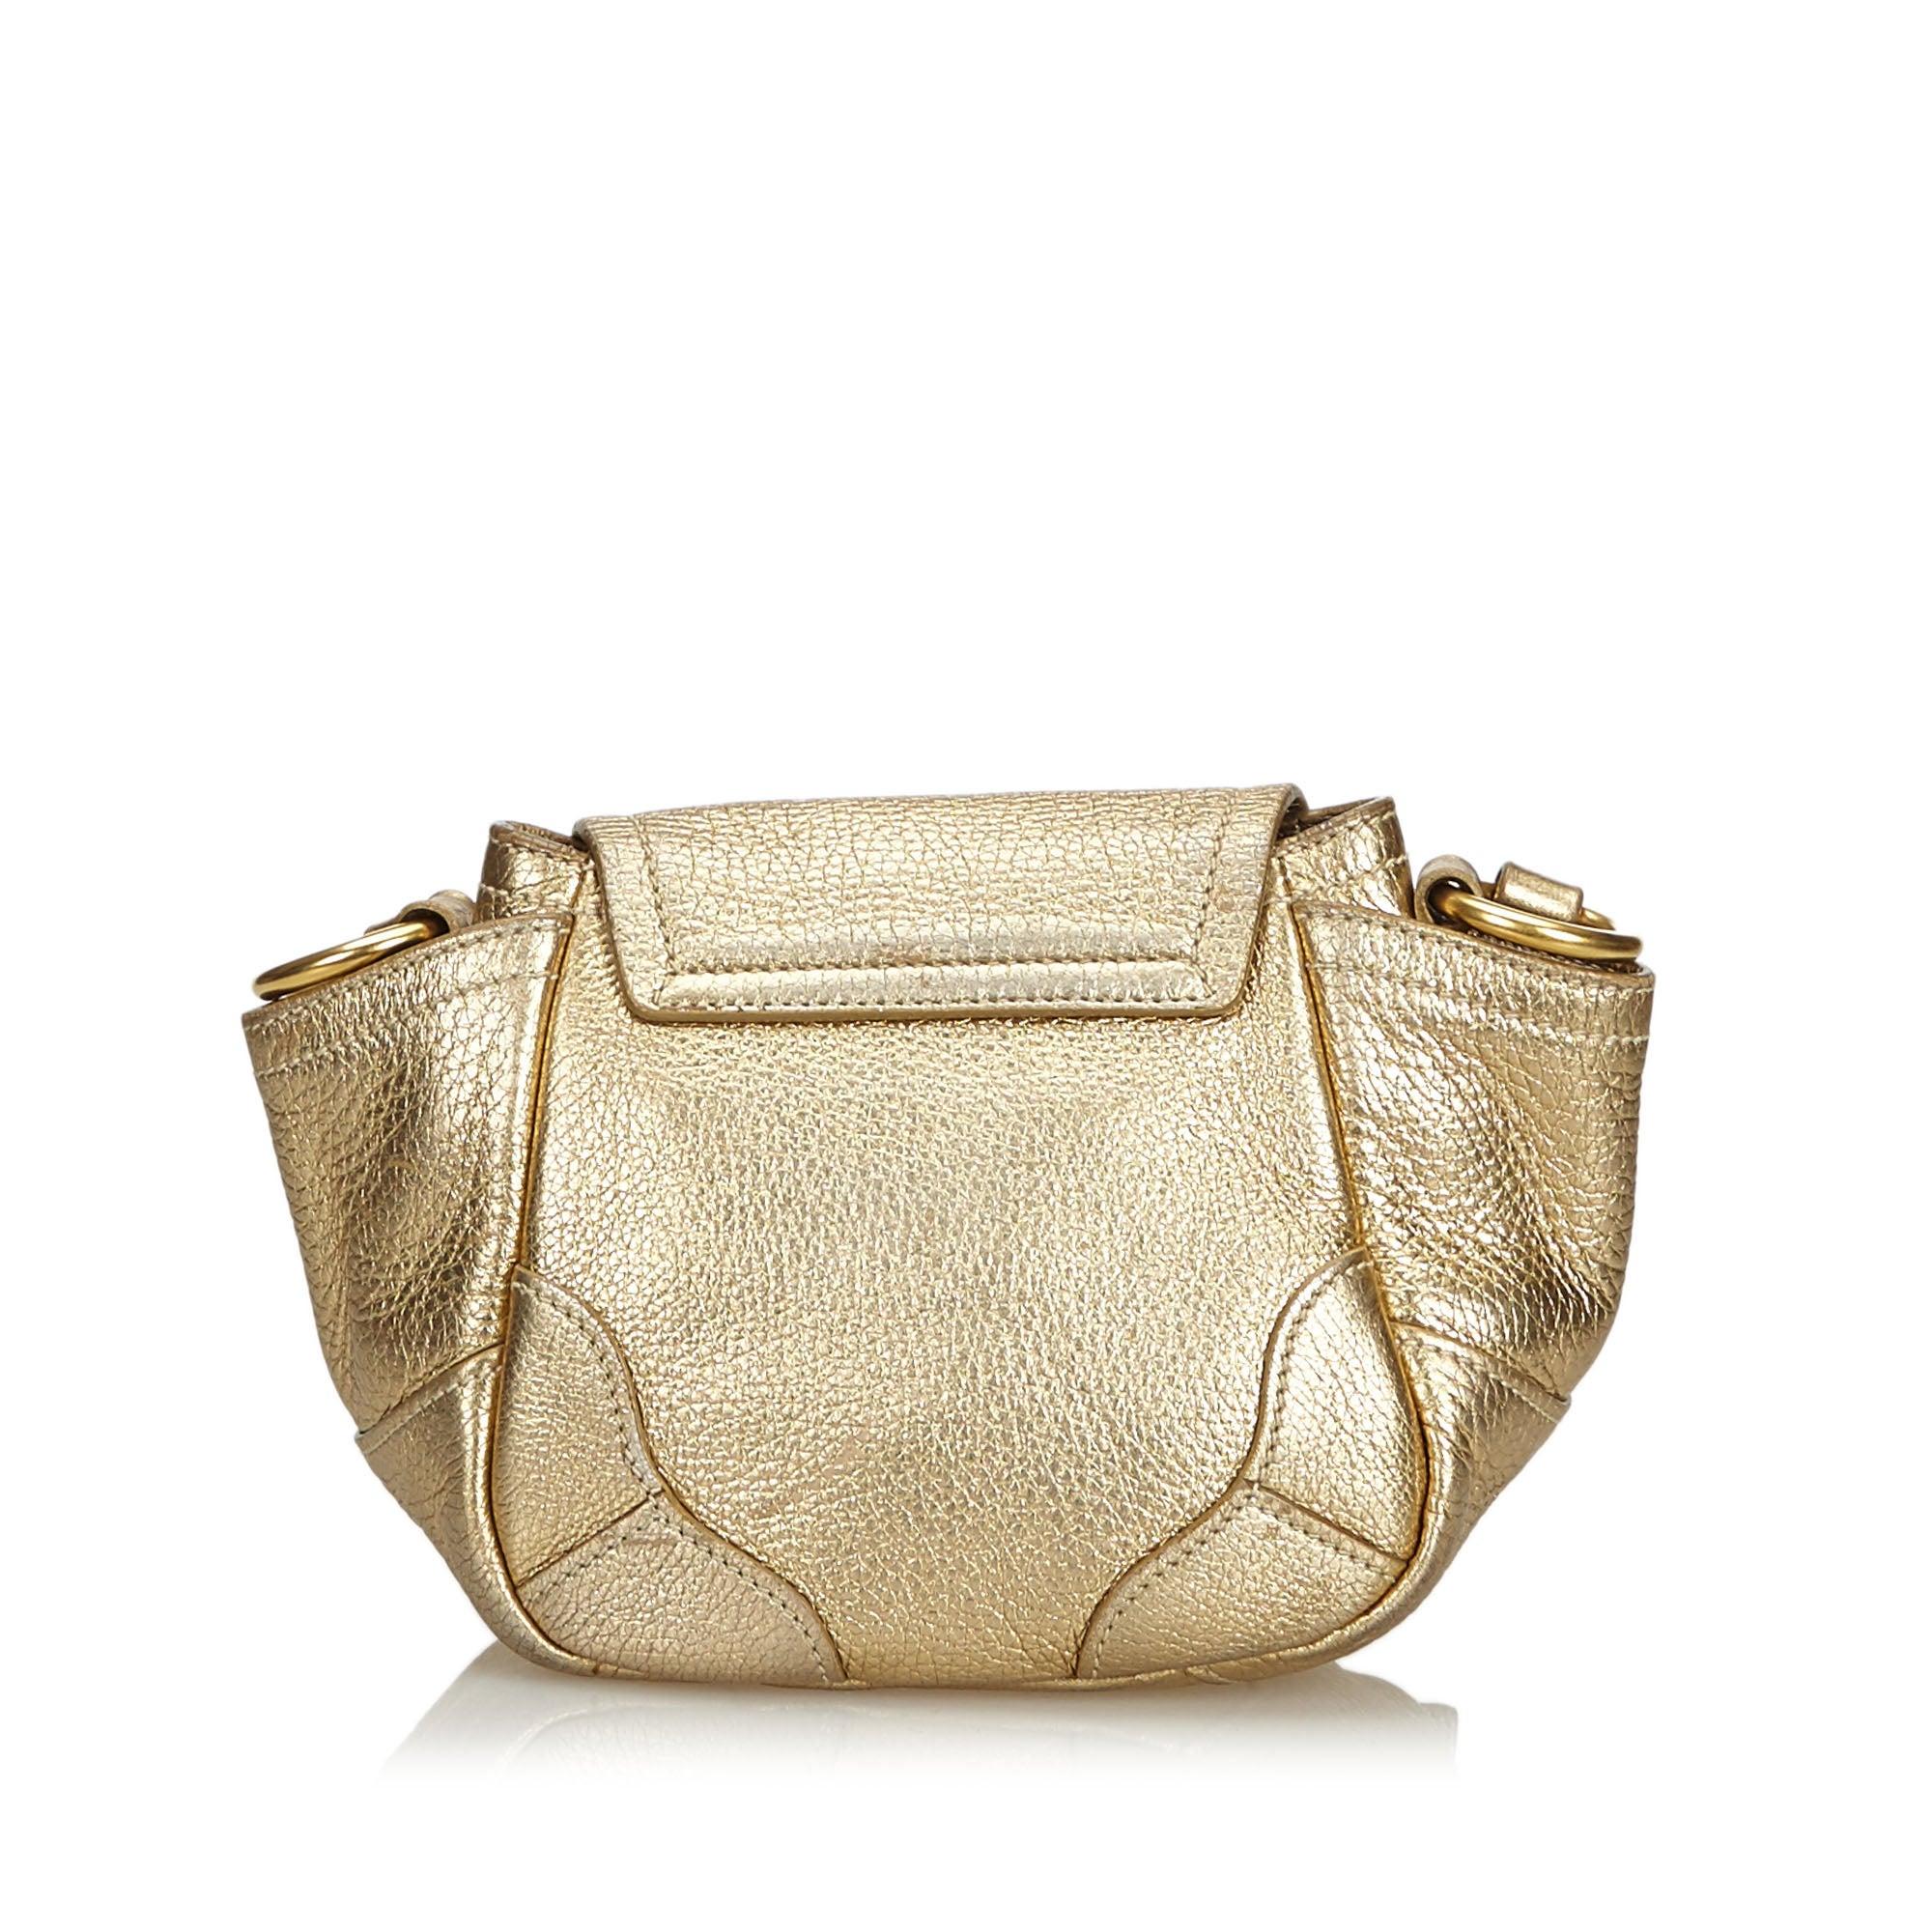 54bd2354f110 Prada Gold Vitello Daino Bandoliera Crossbody Bag at 1stdibs